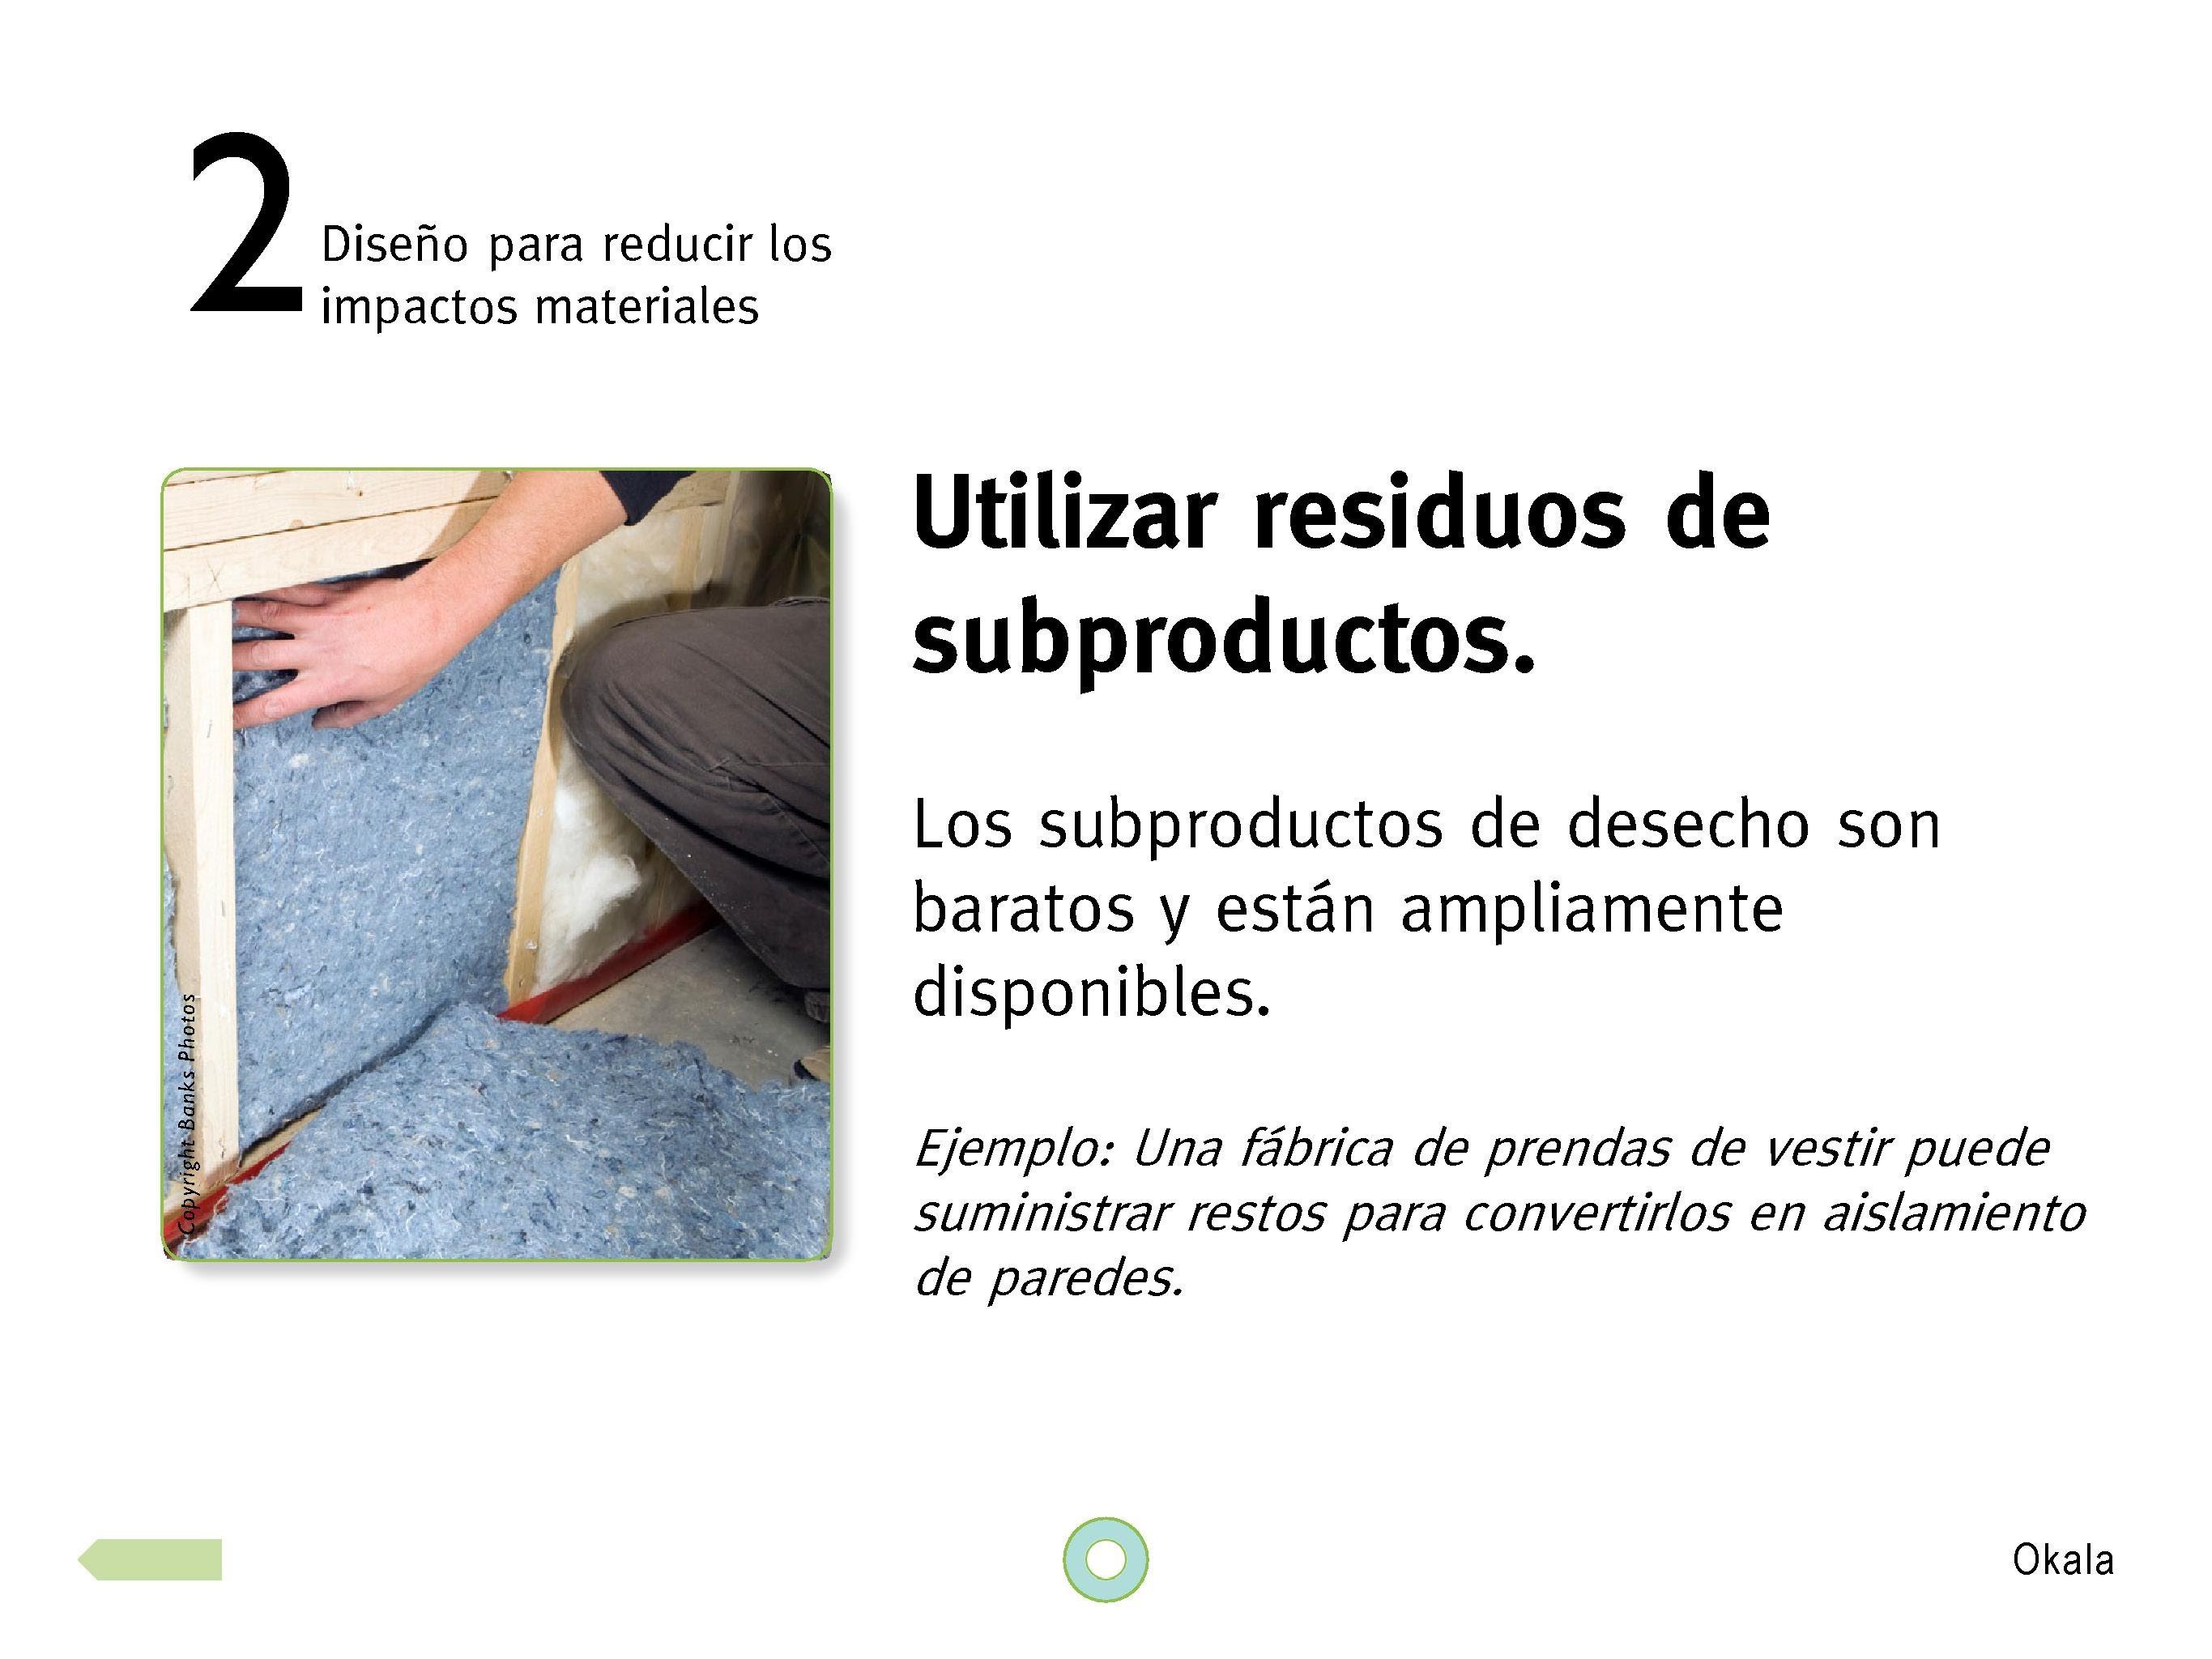 okala-ecodesign-strategy-guide-2012-spanish.new_page_15-1